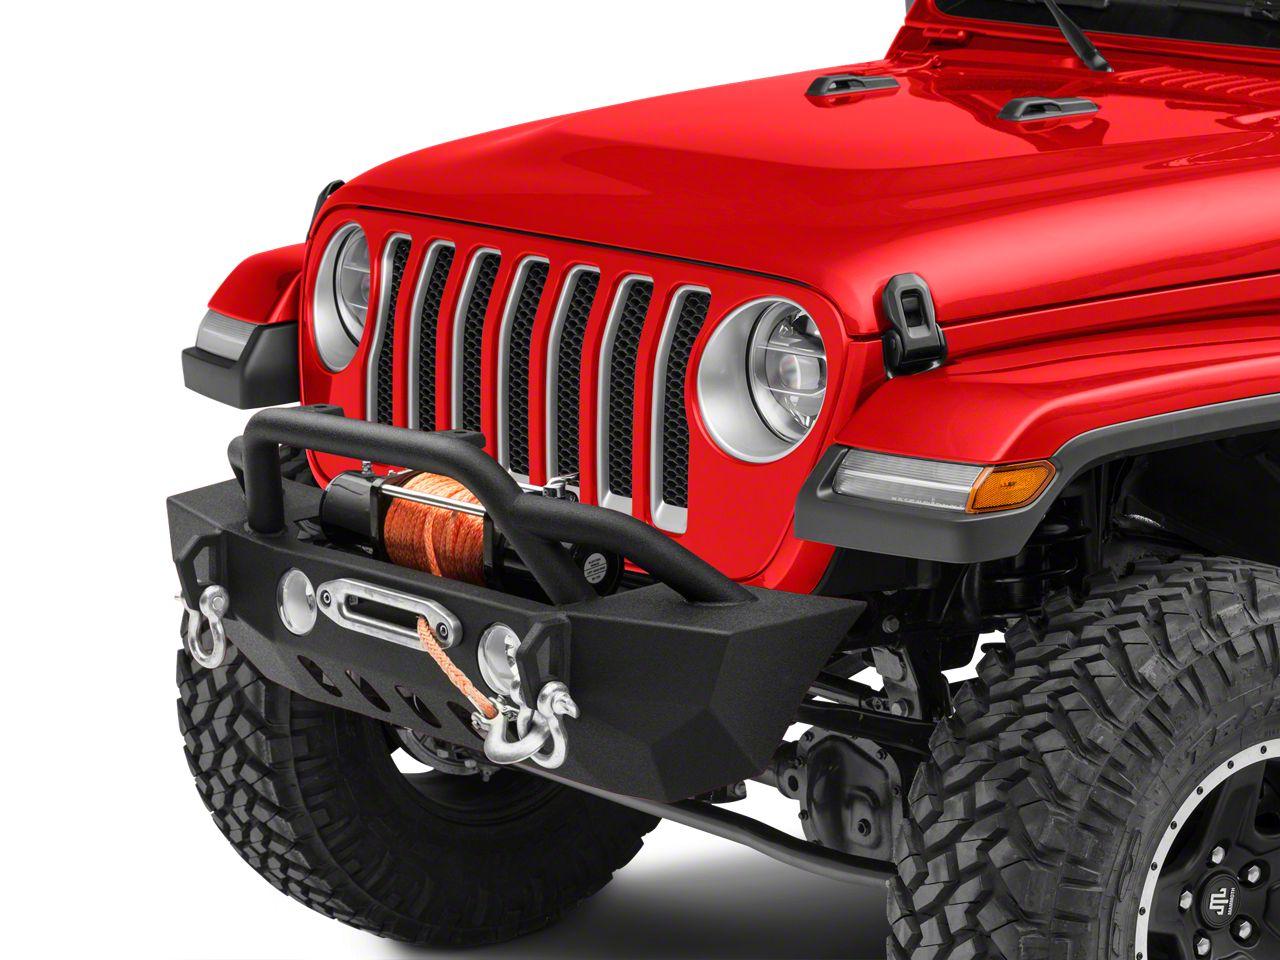 RedRock 4x4 Crawler Stubby Front Bumper w/ Winch Mount (2018 Jeep Wrangler JL)